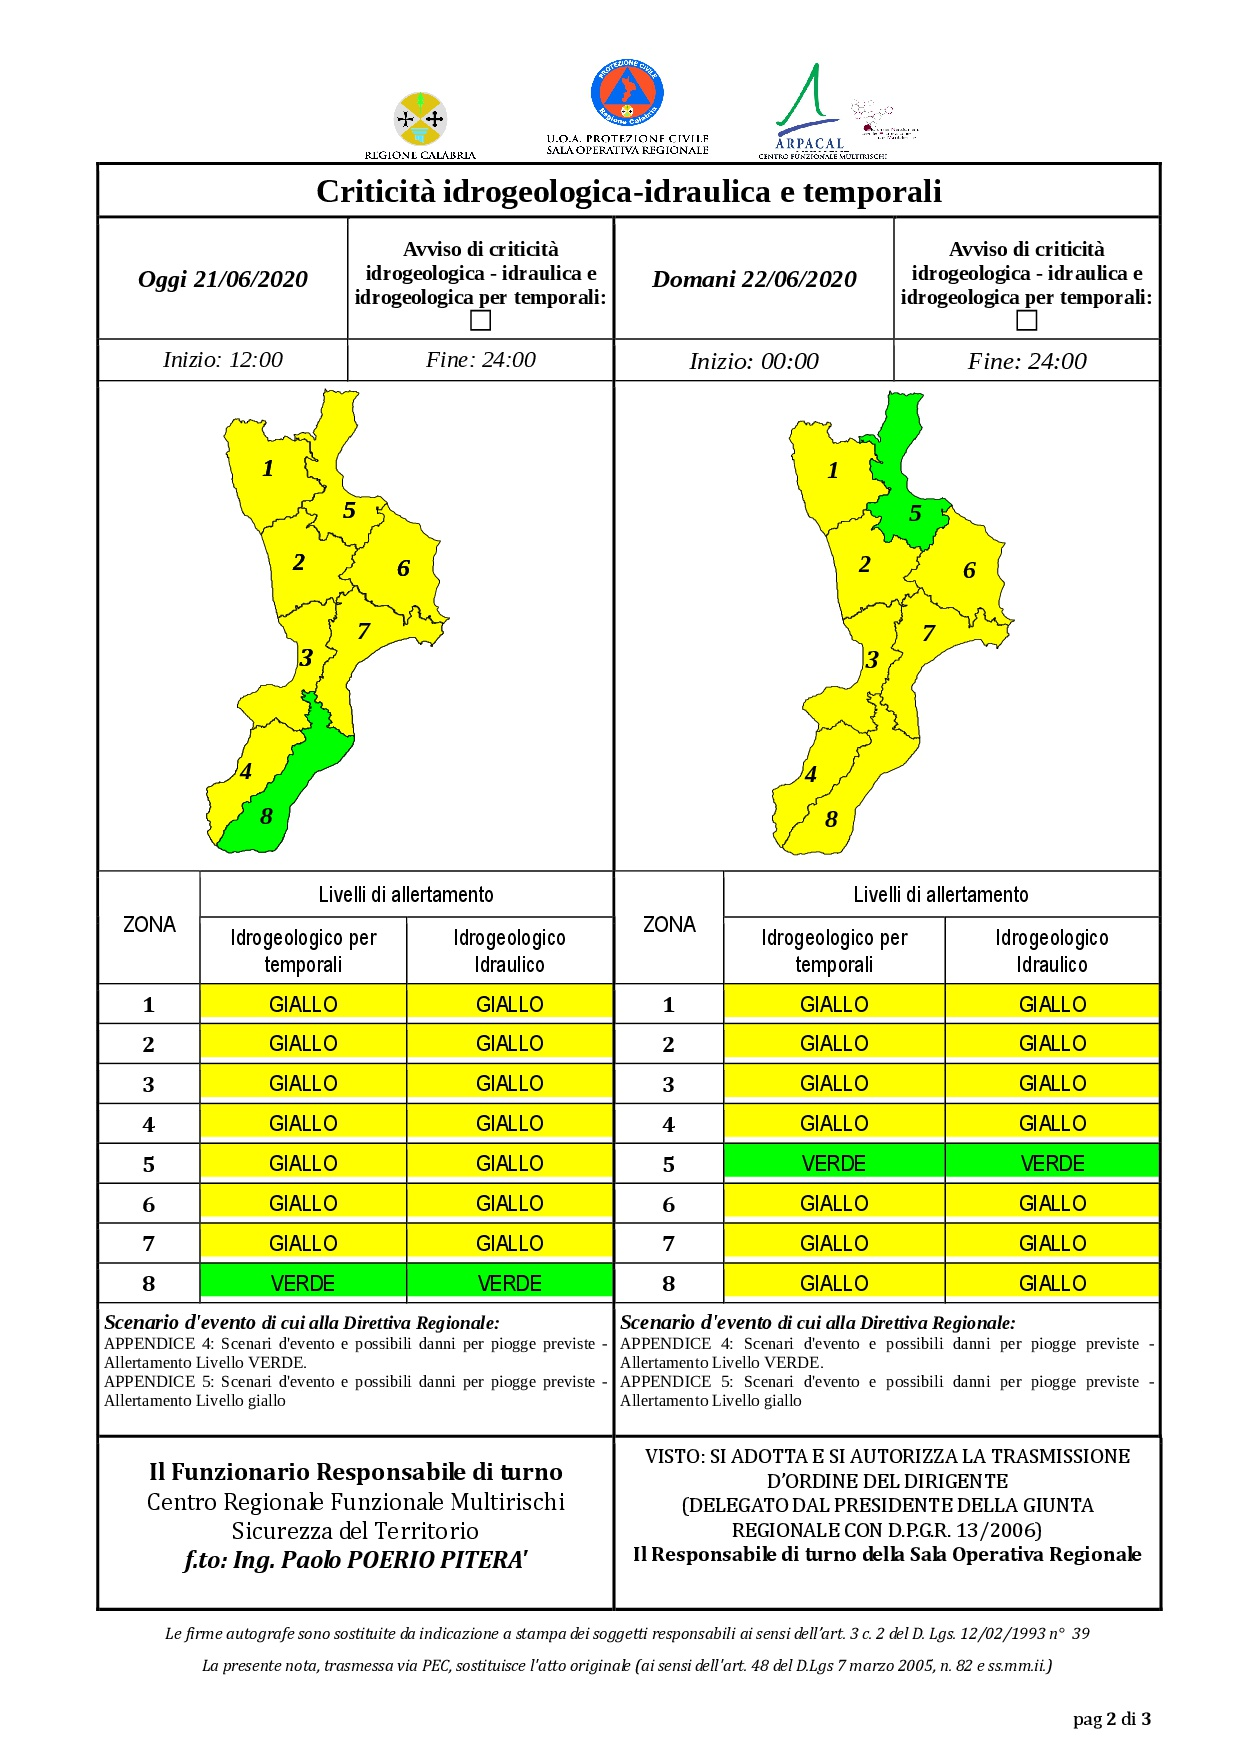 Criticità idrogeologica-idraulica e temporali in Calabria 21-06-2020